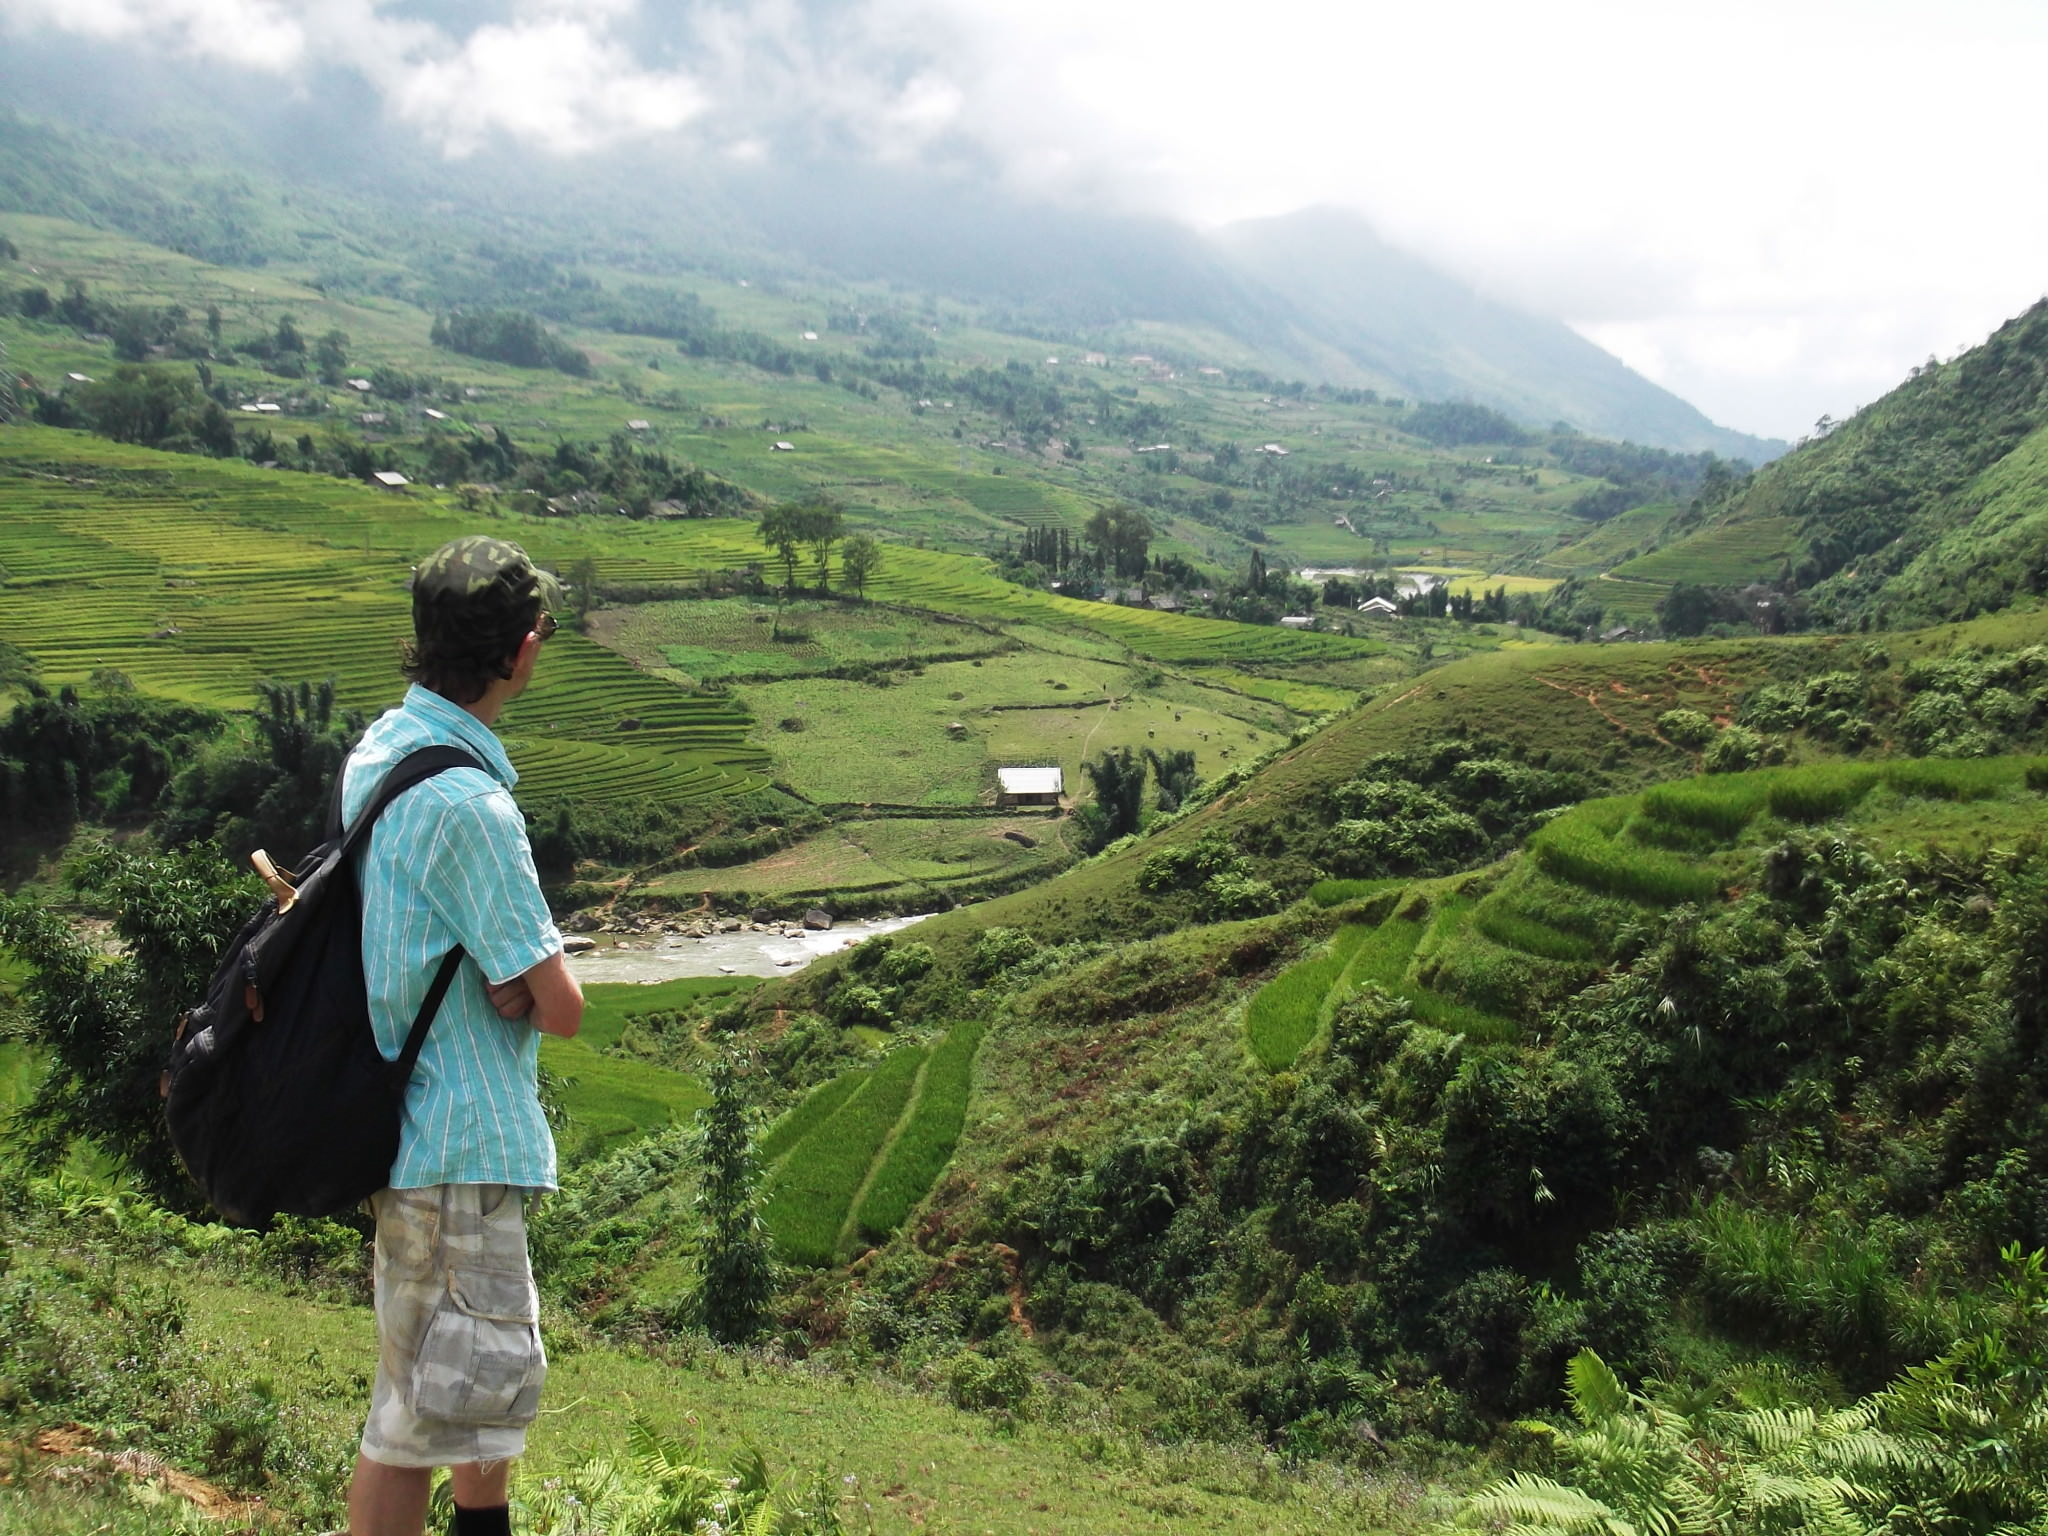 jonny blair hiking in sapa vietnam